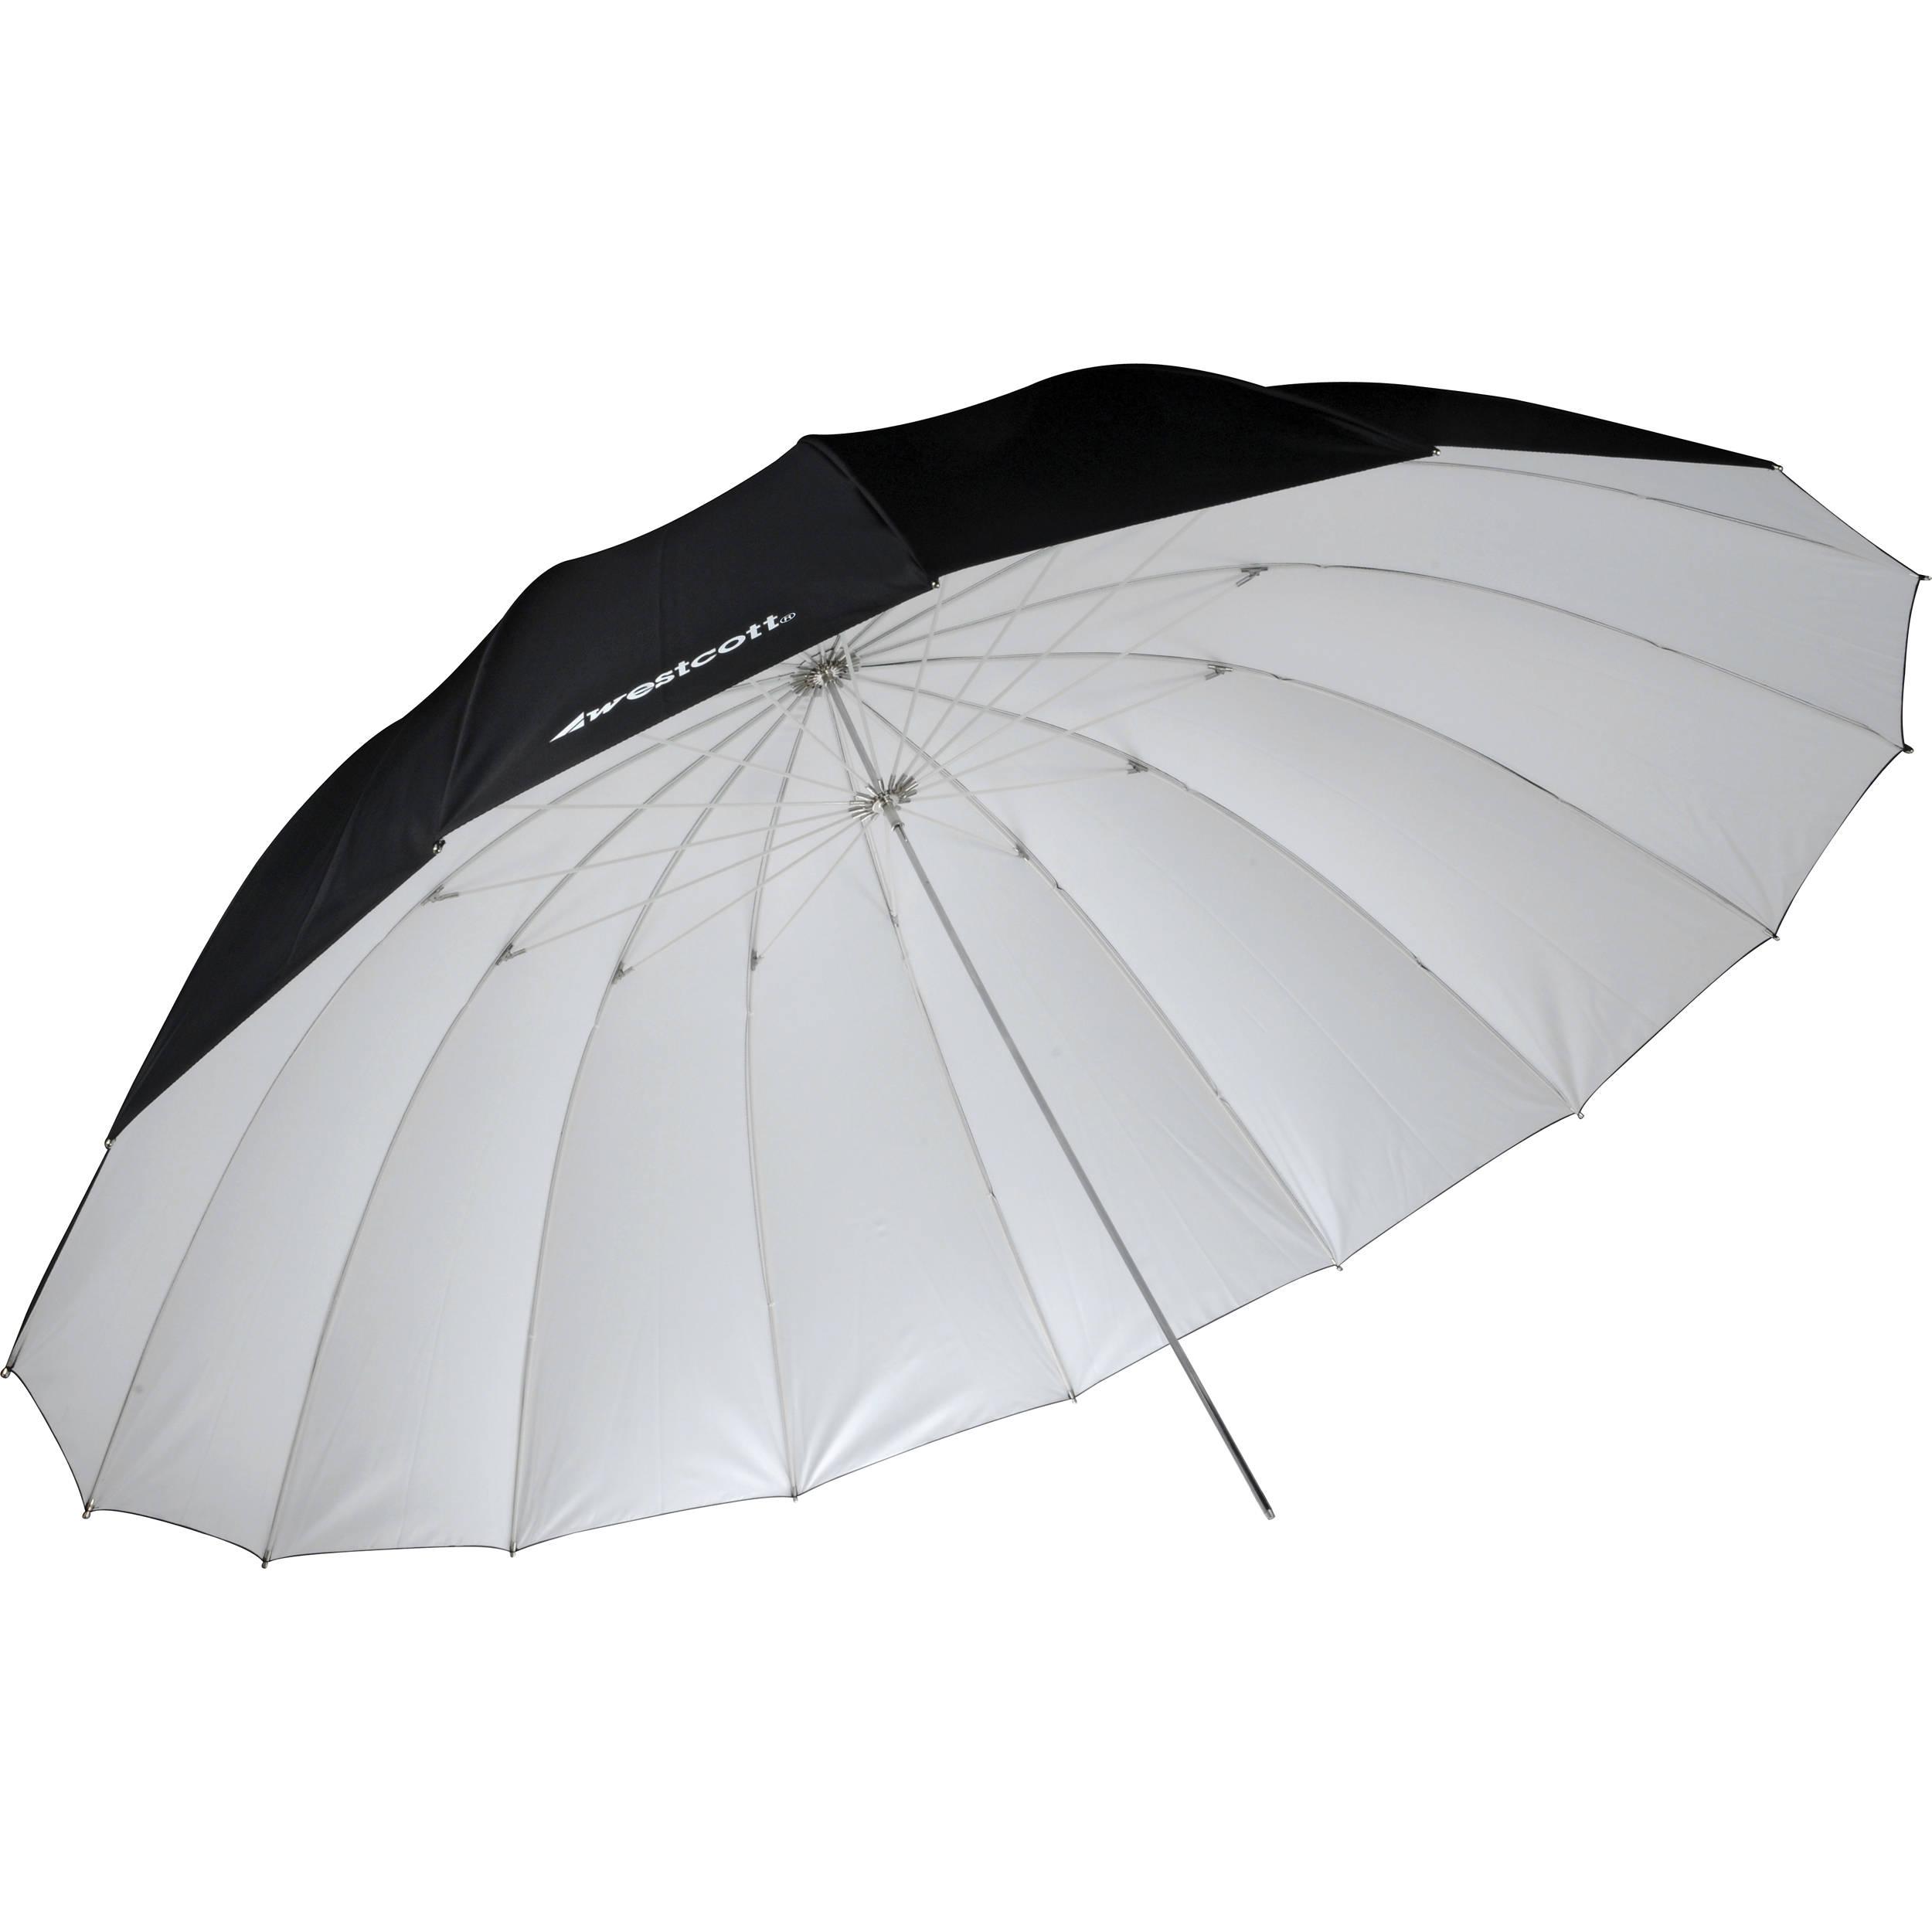 Amazoncom AMIR Patio Umbrella Light 3 Lighting Modes